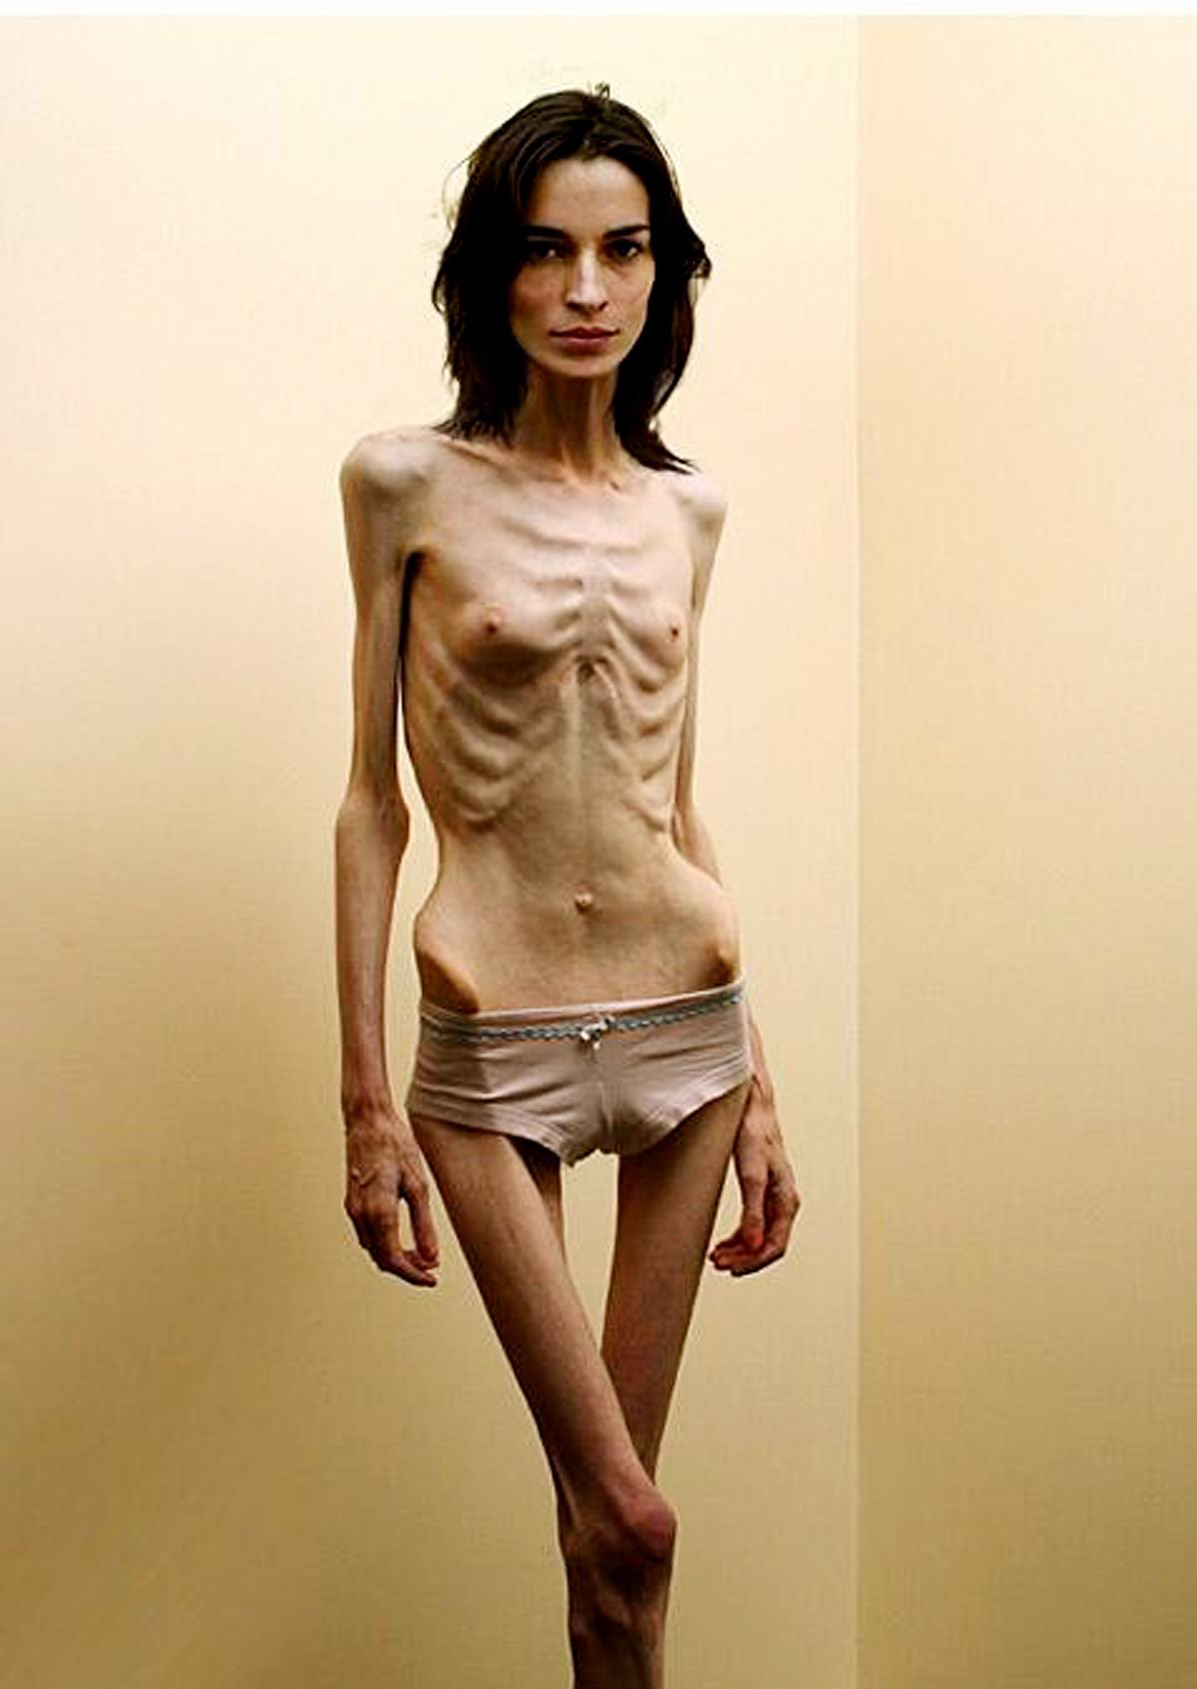 World skinniest naked women, free gif amatuer swingers